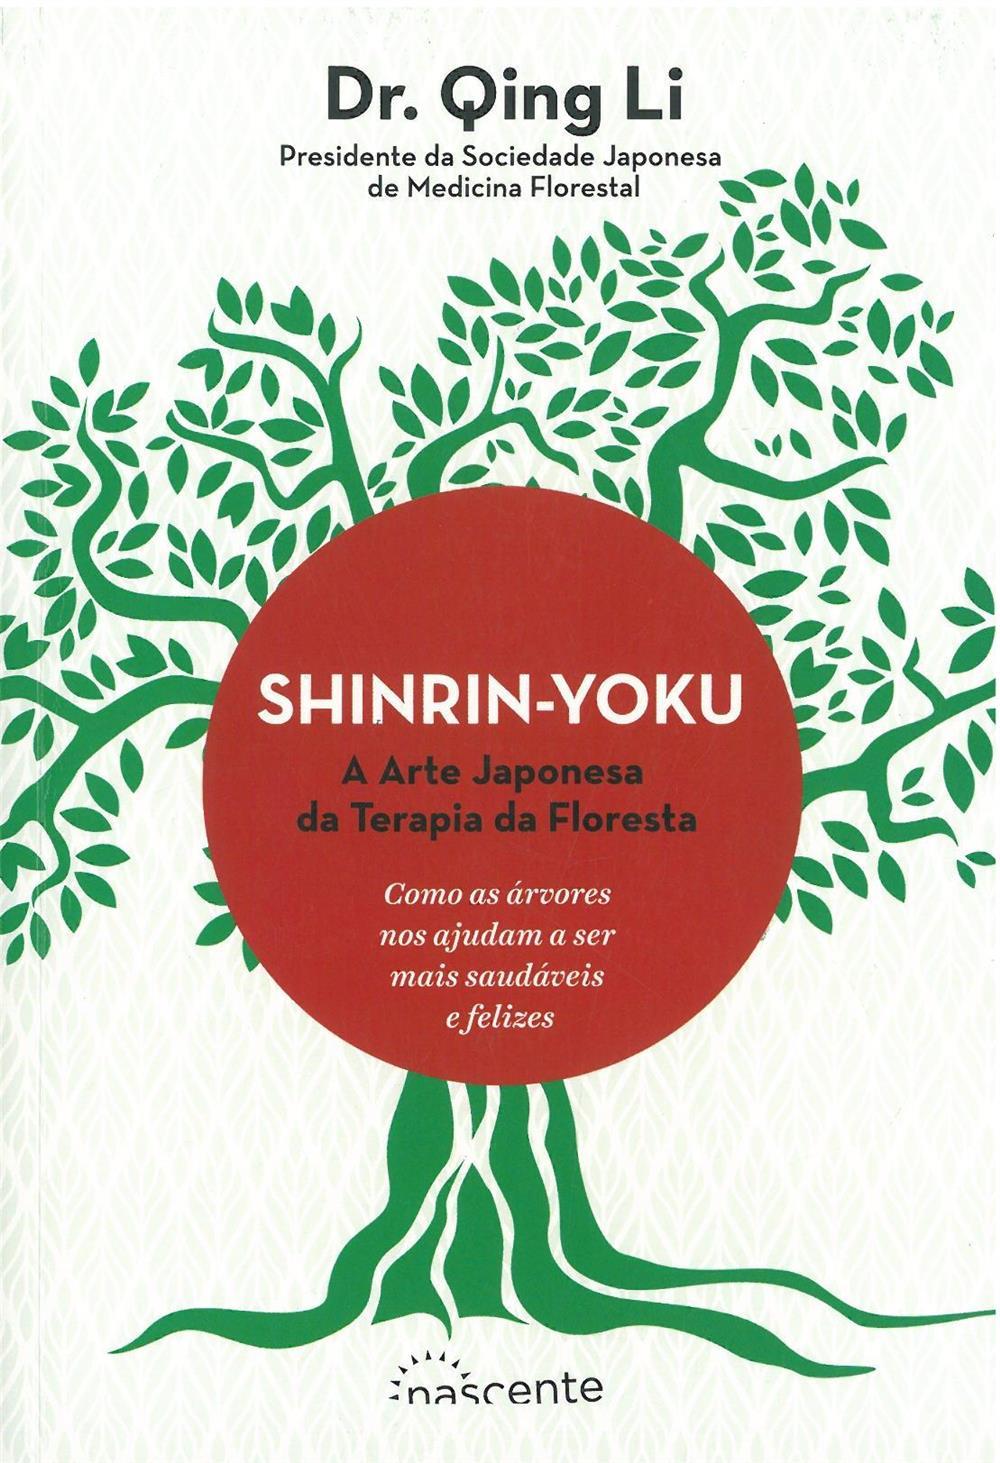 Shinrin-yoku_a arte japonesa da terapia da floresta_.jpg